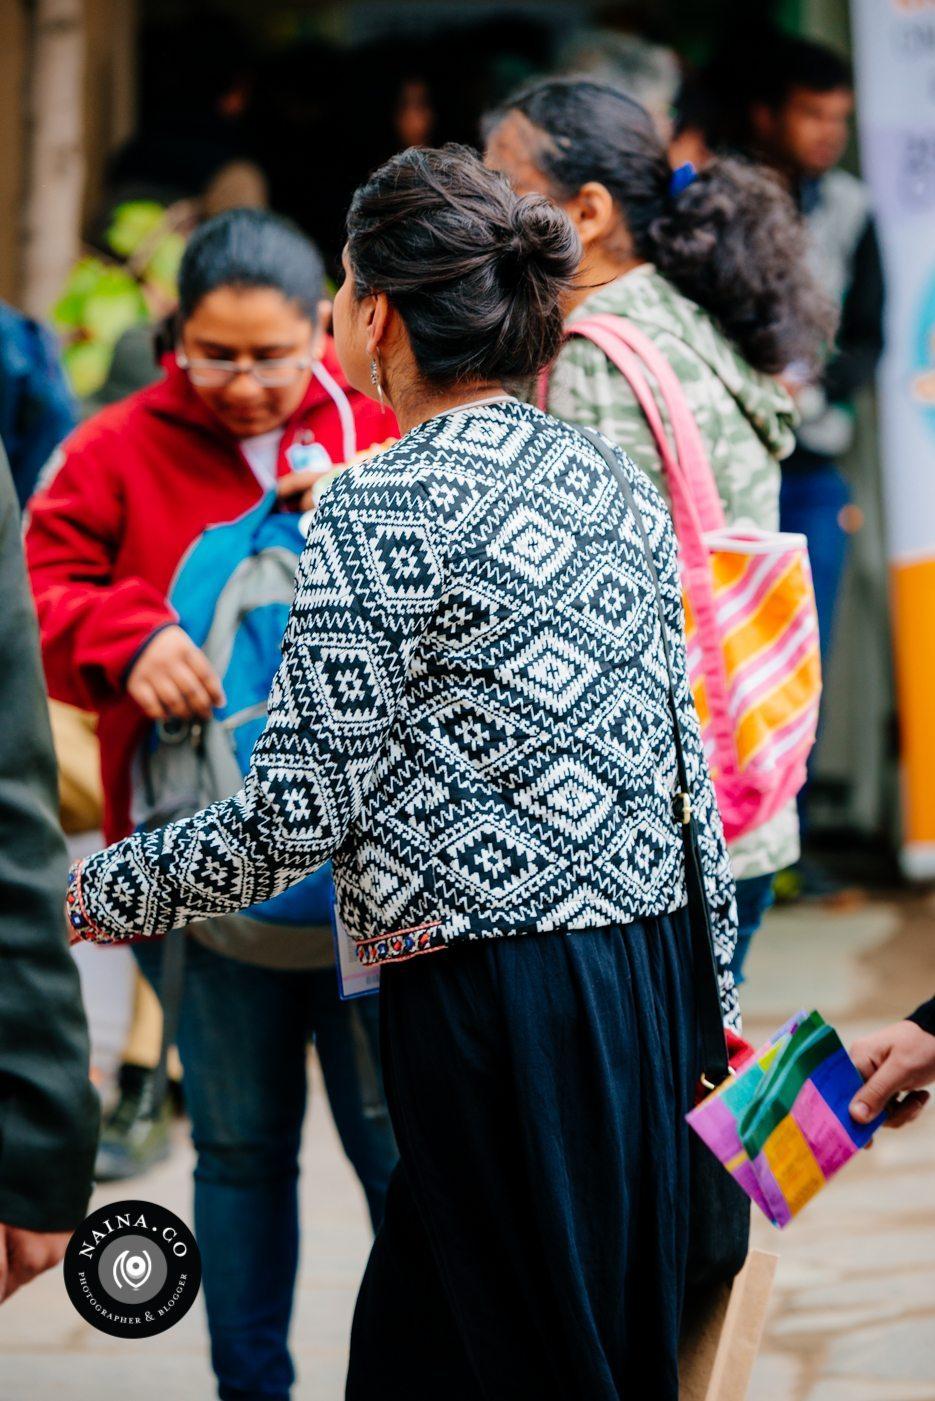 Naina.co-Raconteuse-Visuelle-Photographer-Blogger-Storyteller-Luxury-Lifestyle-January-2015-Jaipur-Literature-Festival-StRegis-LeMeridien-ZeeJLF-EyesForStreetStyle-15